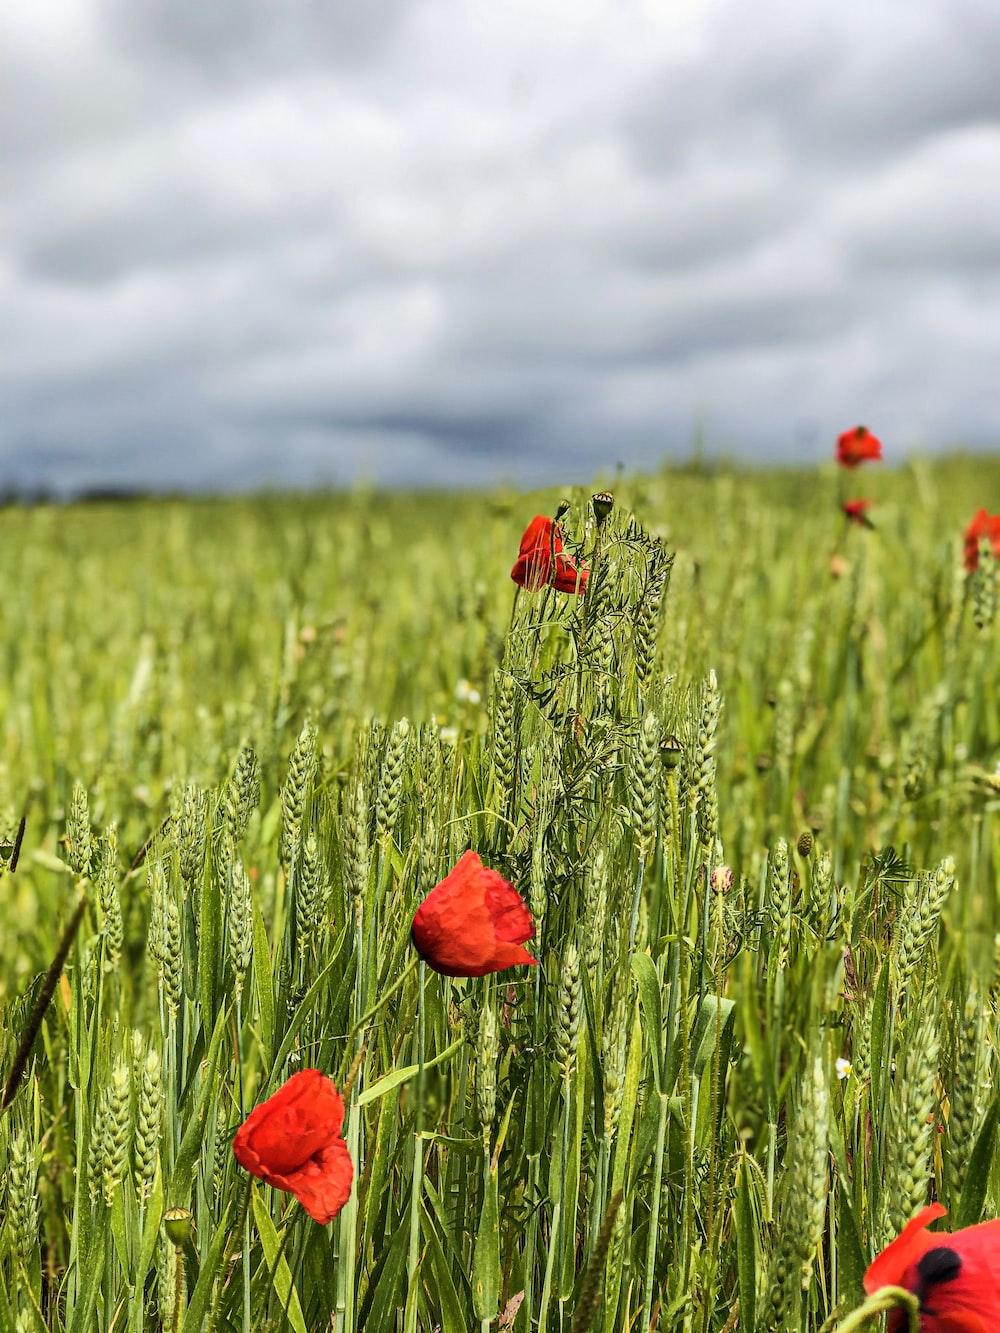 blooming red poppy flowers in green wheat field